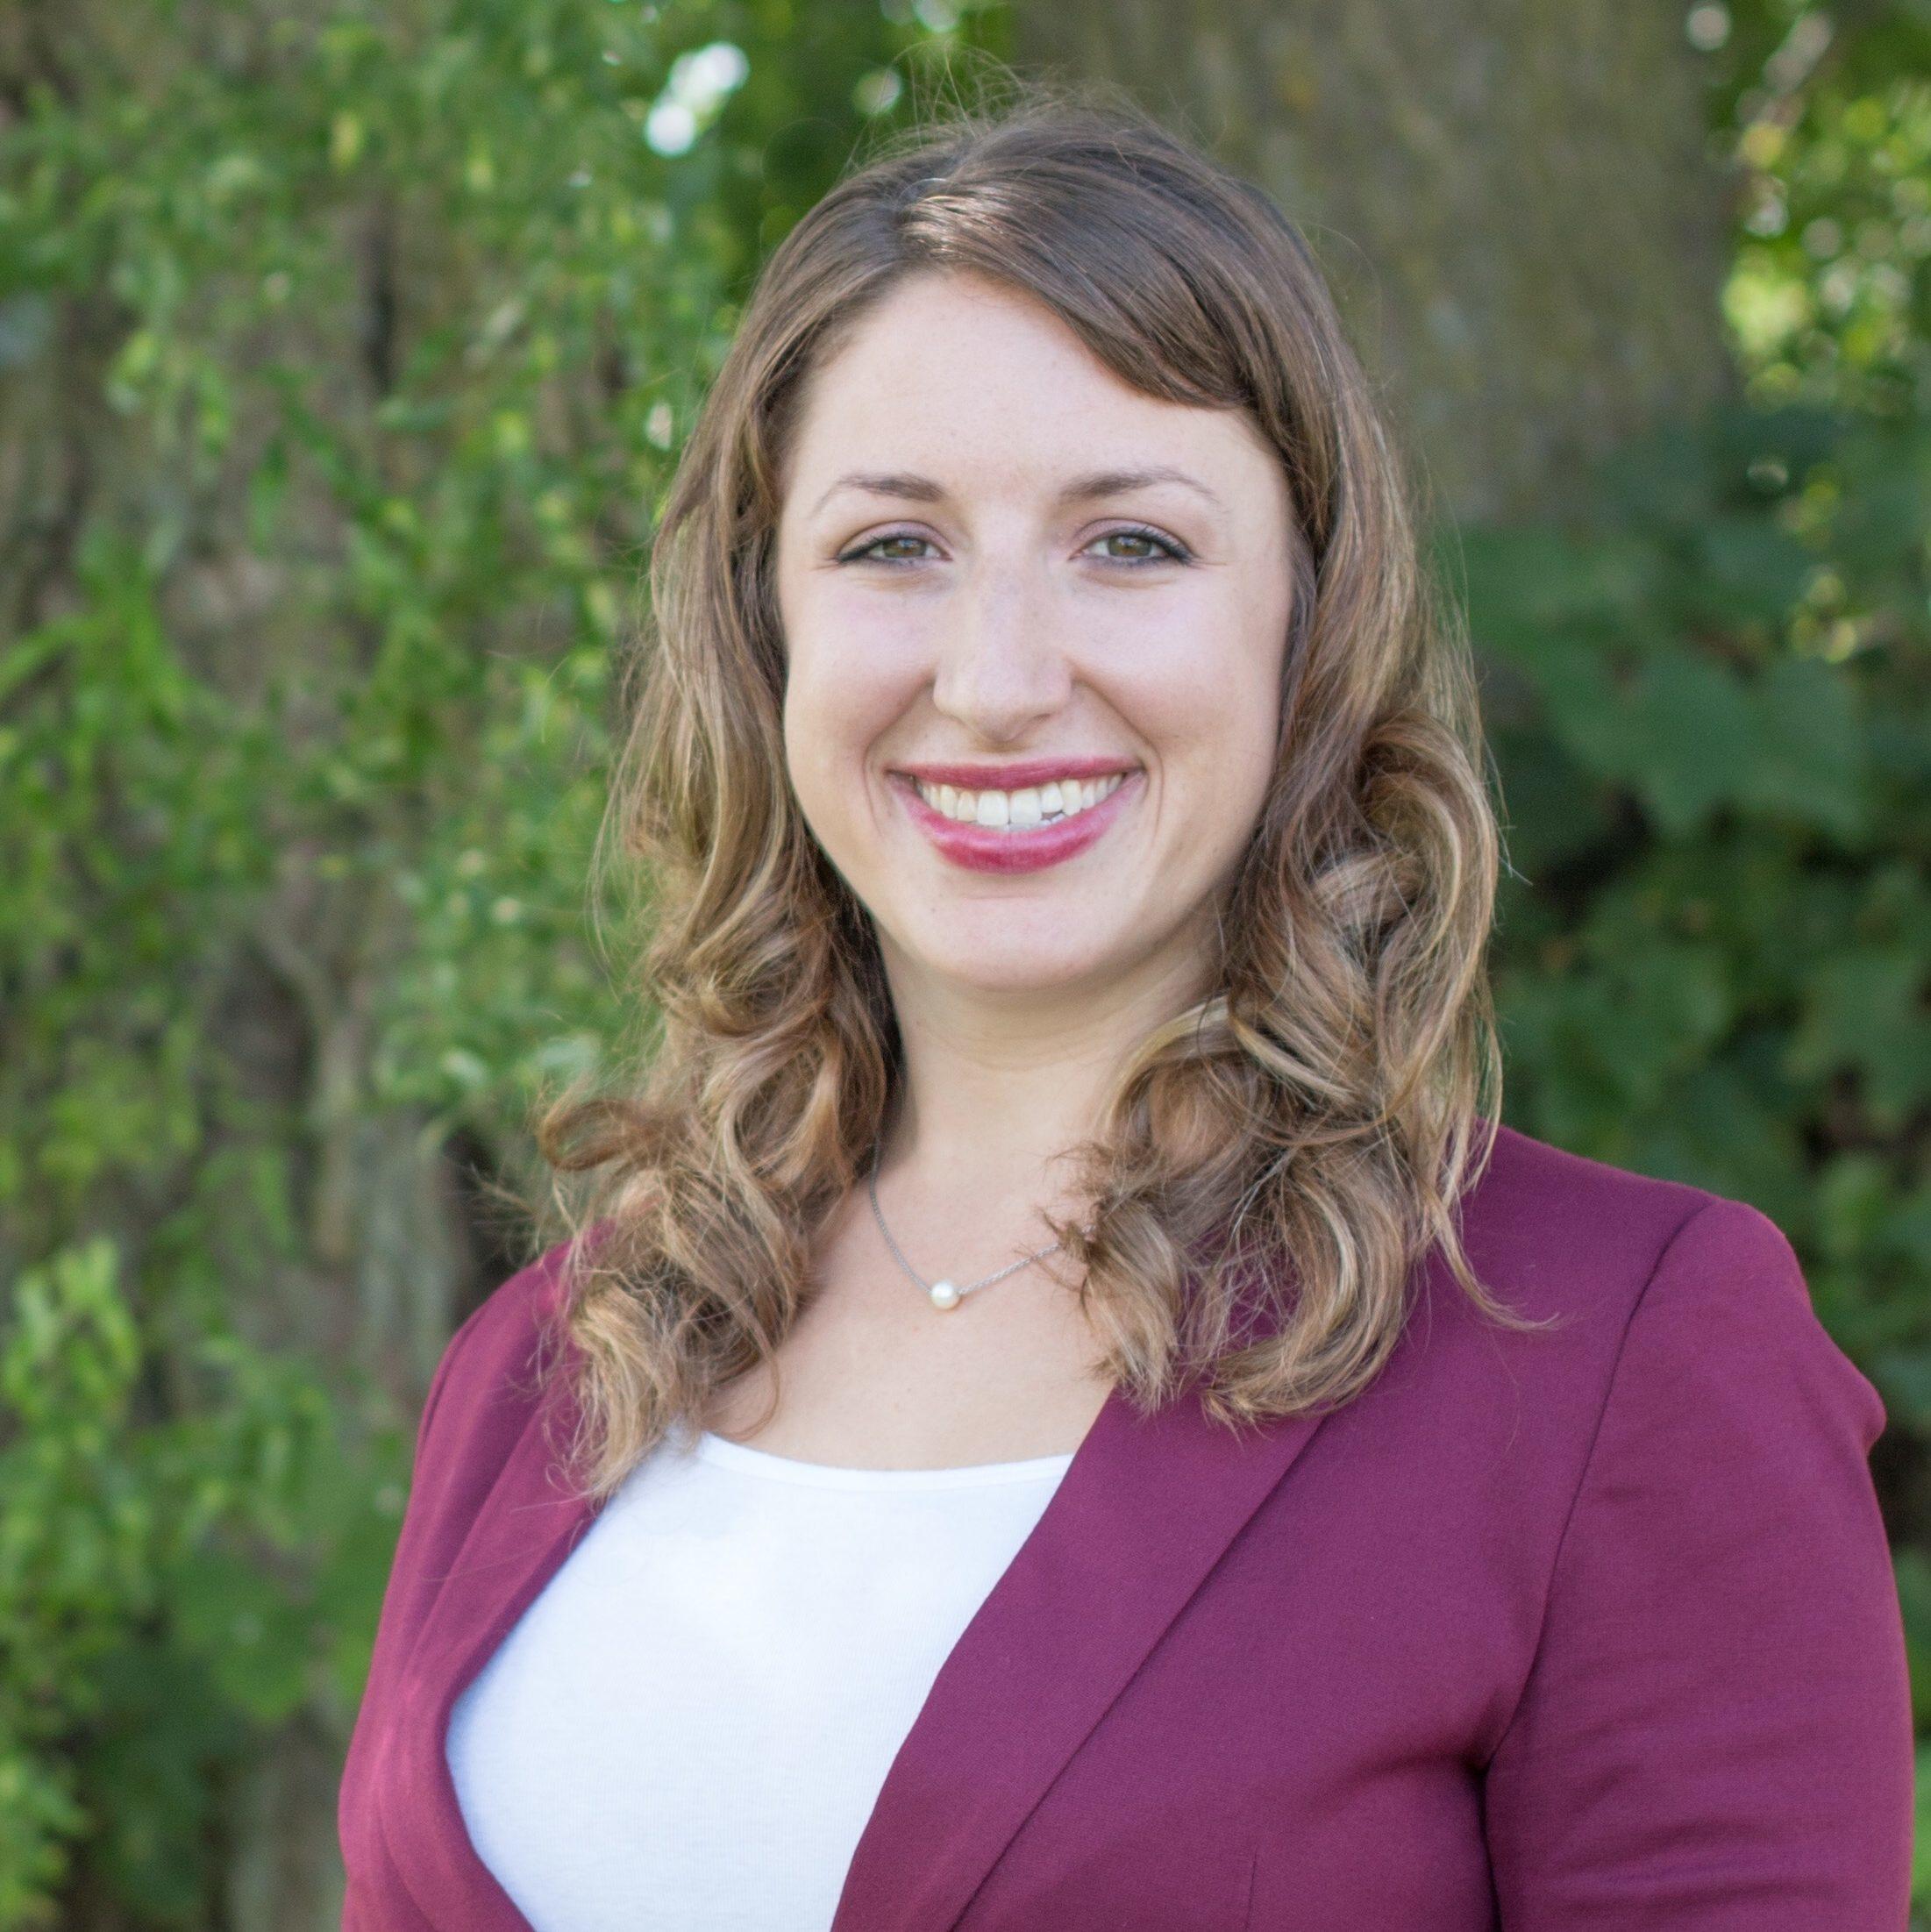 profile image Rebekah McBride